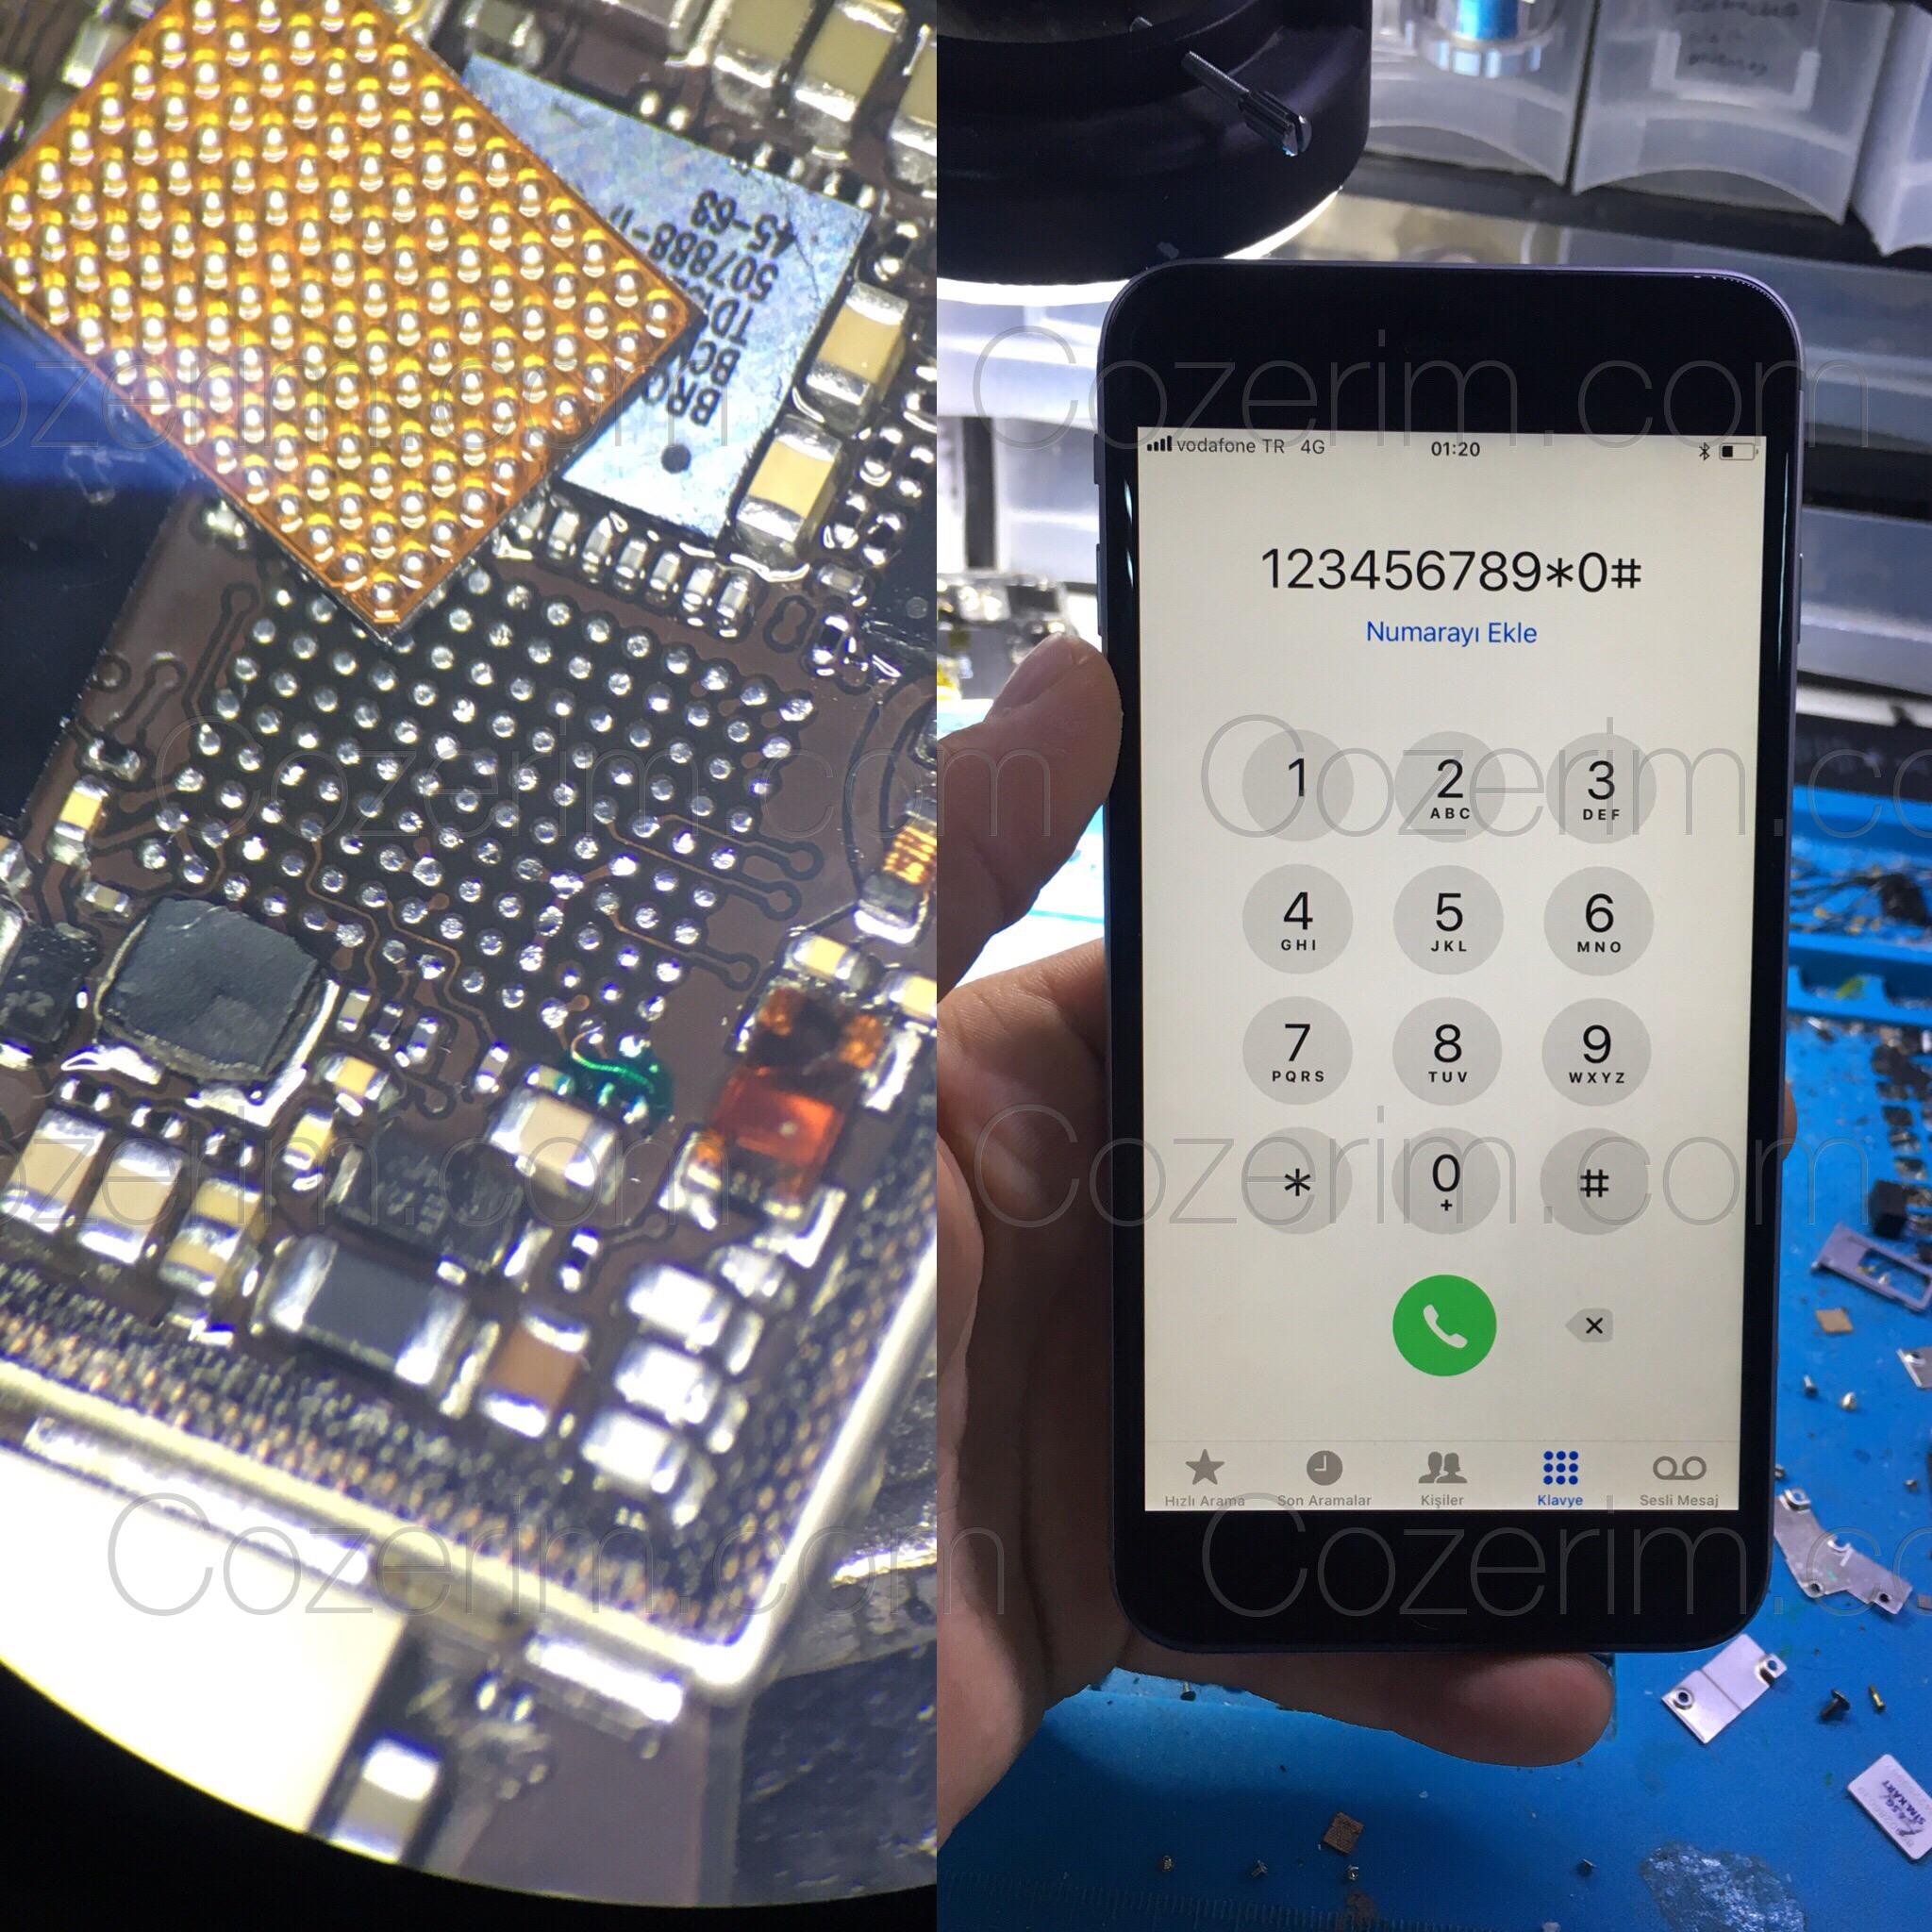 iphone-6-plus-dokunmatik-entegresi-degisimi